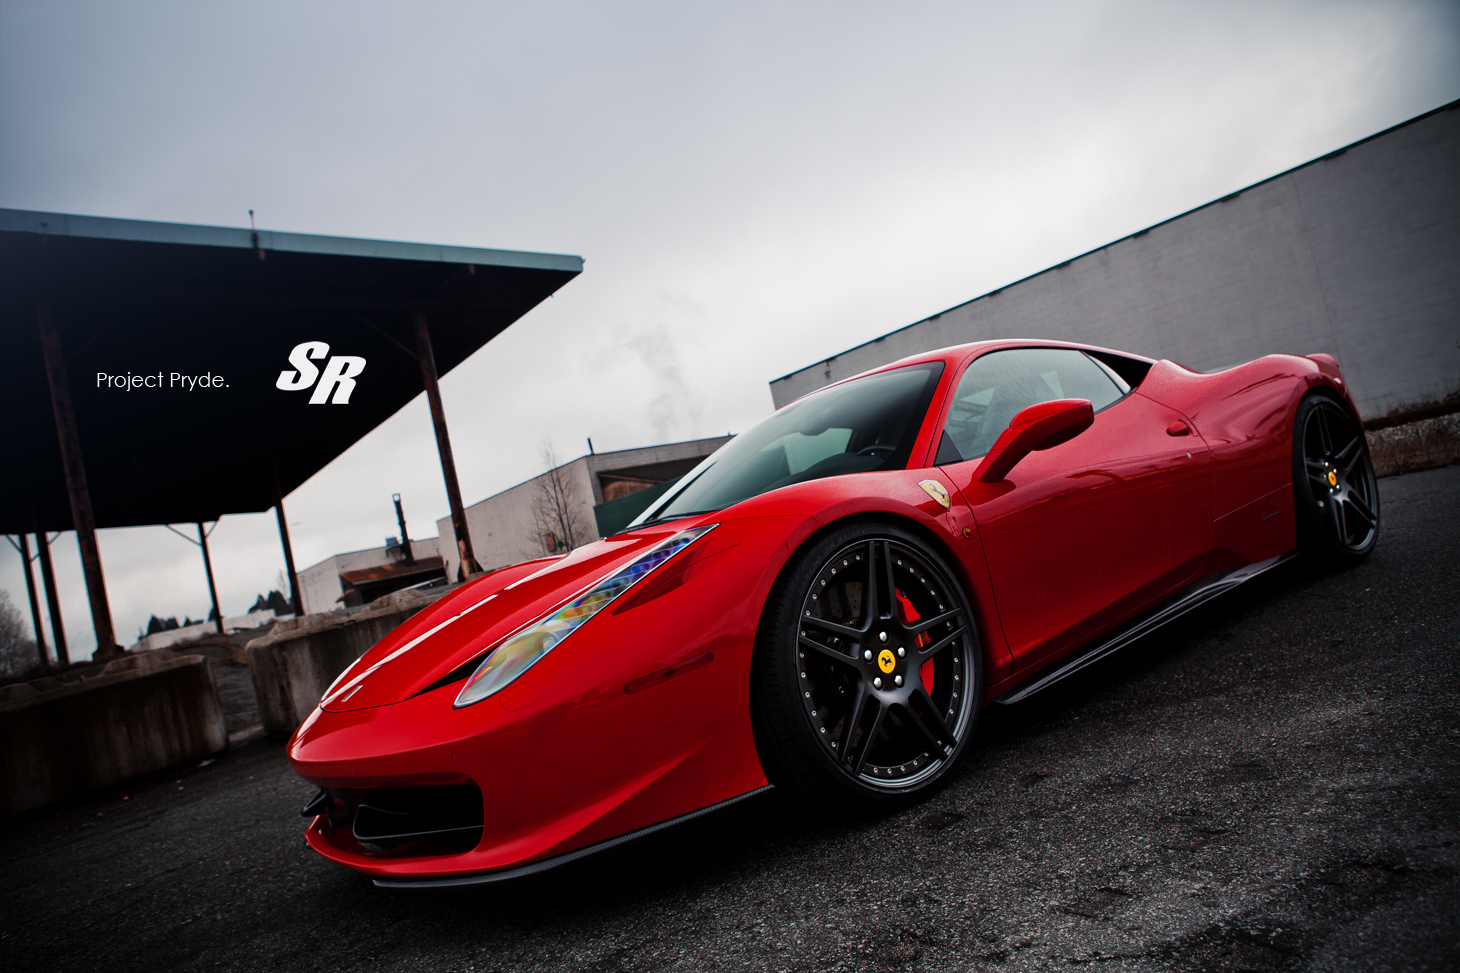 http://www.gtspirit.com/wp-content/gallery/novitec-rosso-ferrari-458-italia-by-sr-auto/red-ferrari-458-italia-on-pur-four-wheels.jpg